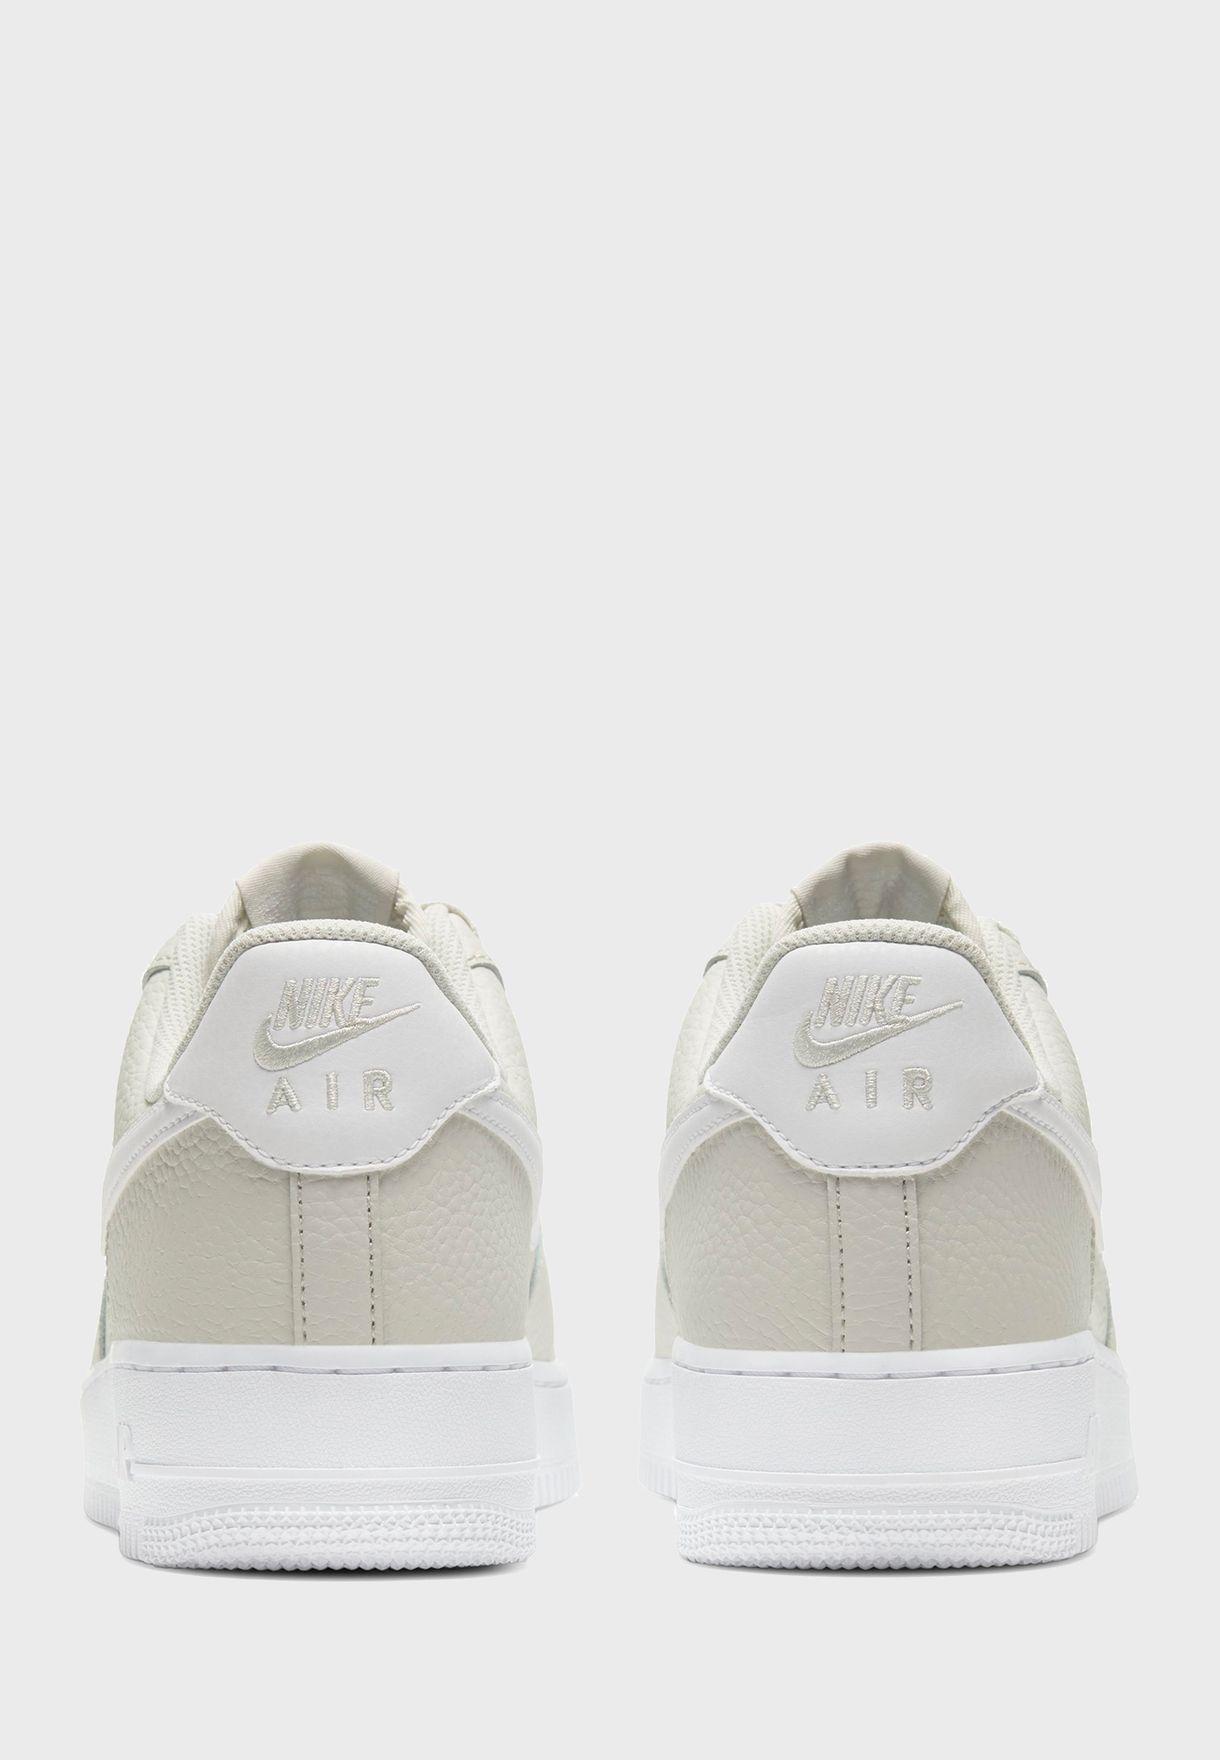 حذاء اير فورس 1 '07 ان21